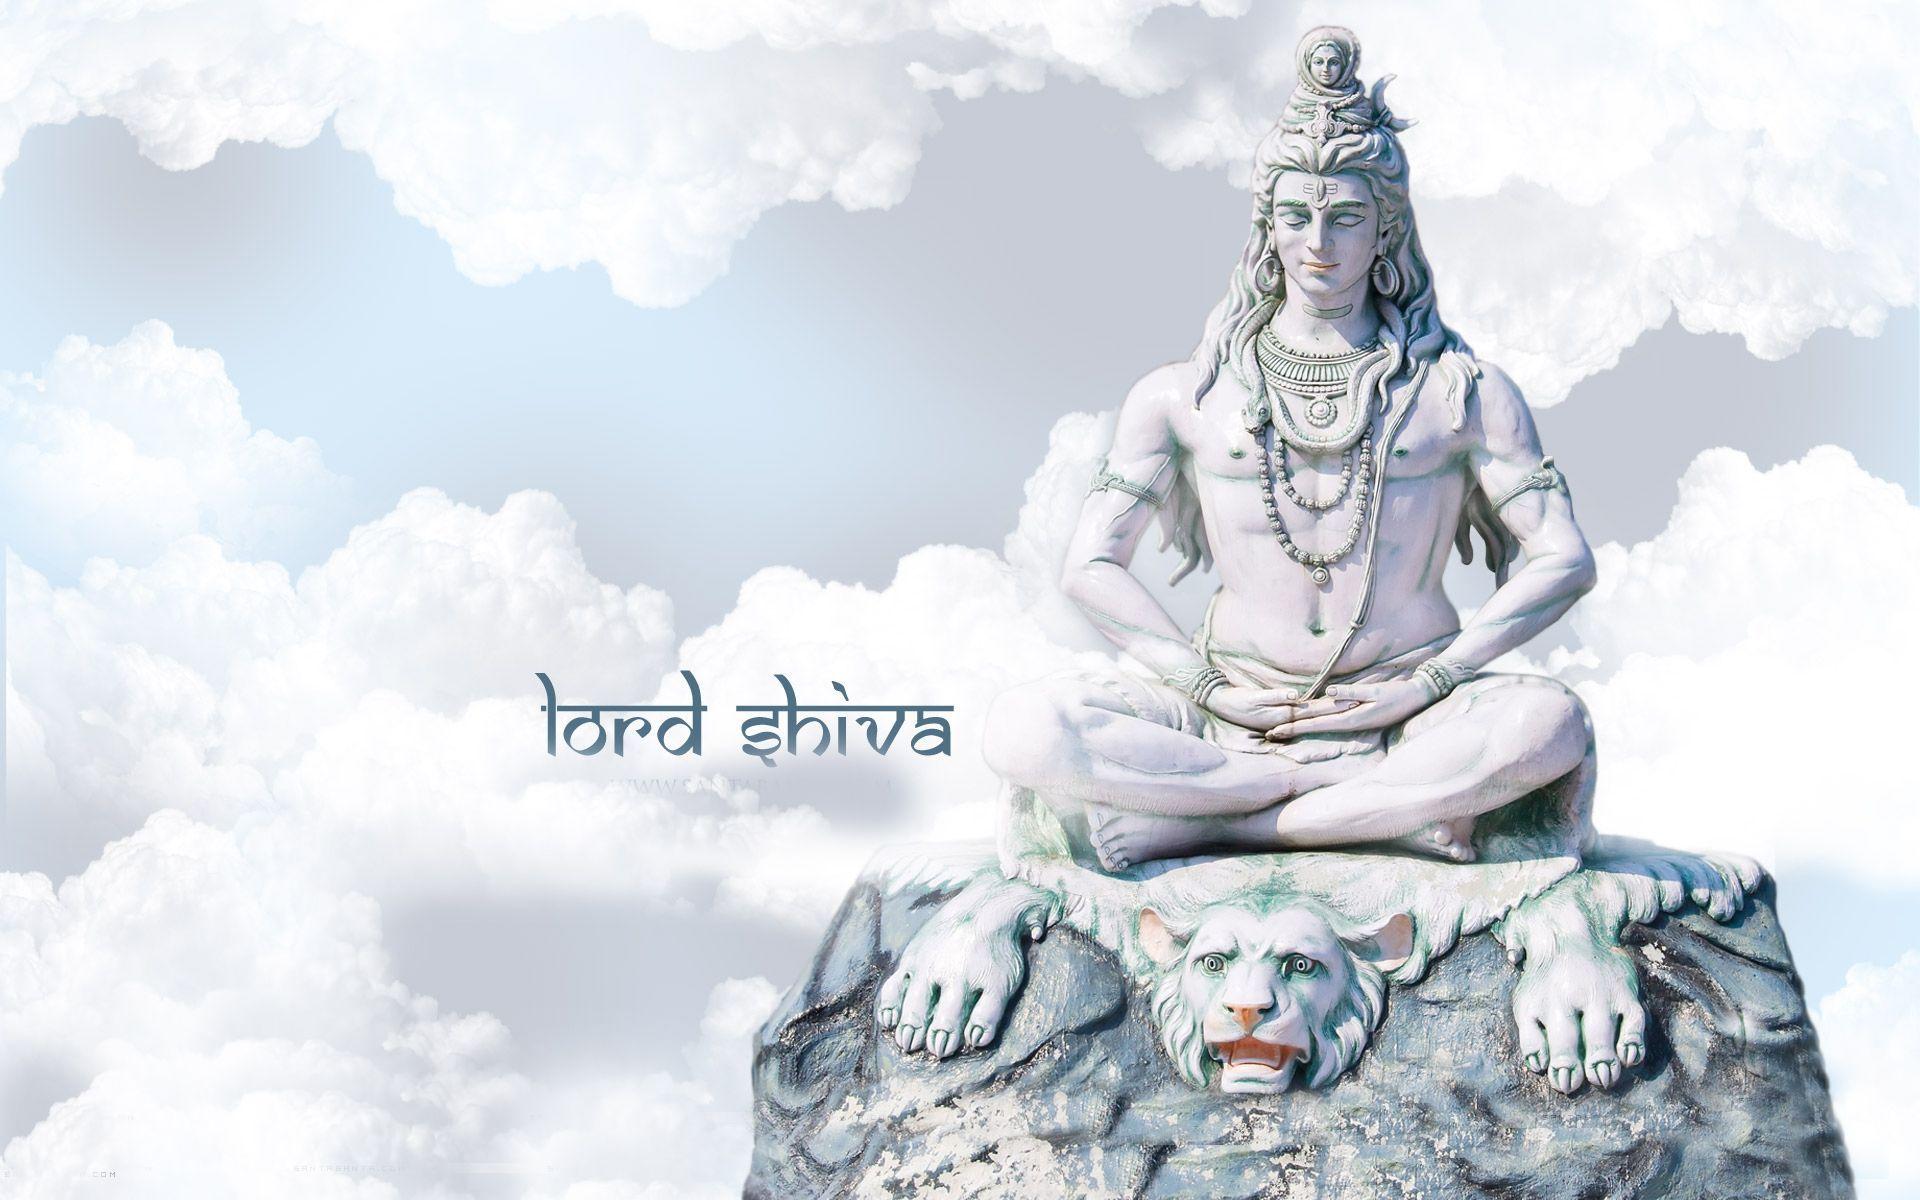 Lord Shiva Mahadev Hd Images Hd Wallpapers Lord Shiva Hd Wallpaper Shiva Wallpaper Mahadev Lord shiva full hd wallpaper for desktop